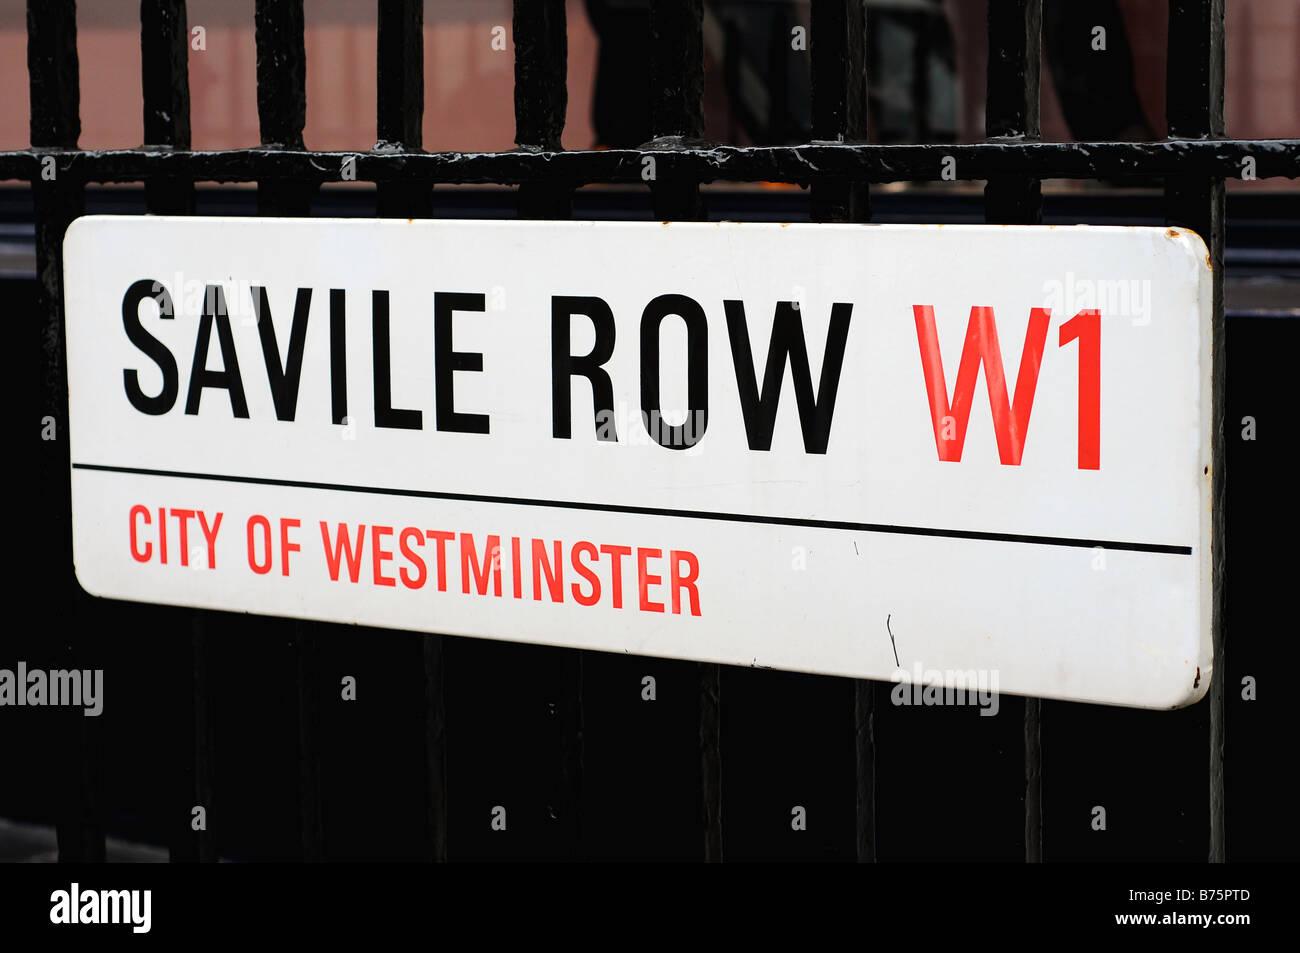 Saville Row street sign, London, England - Stock Image